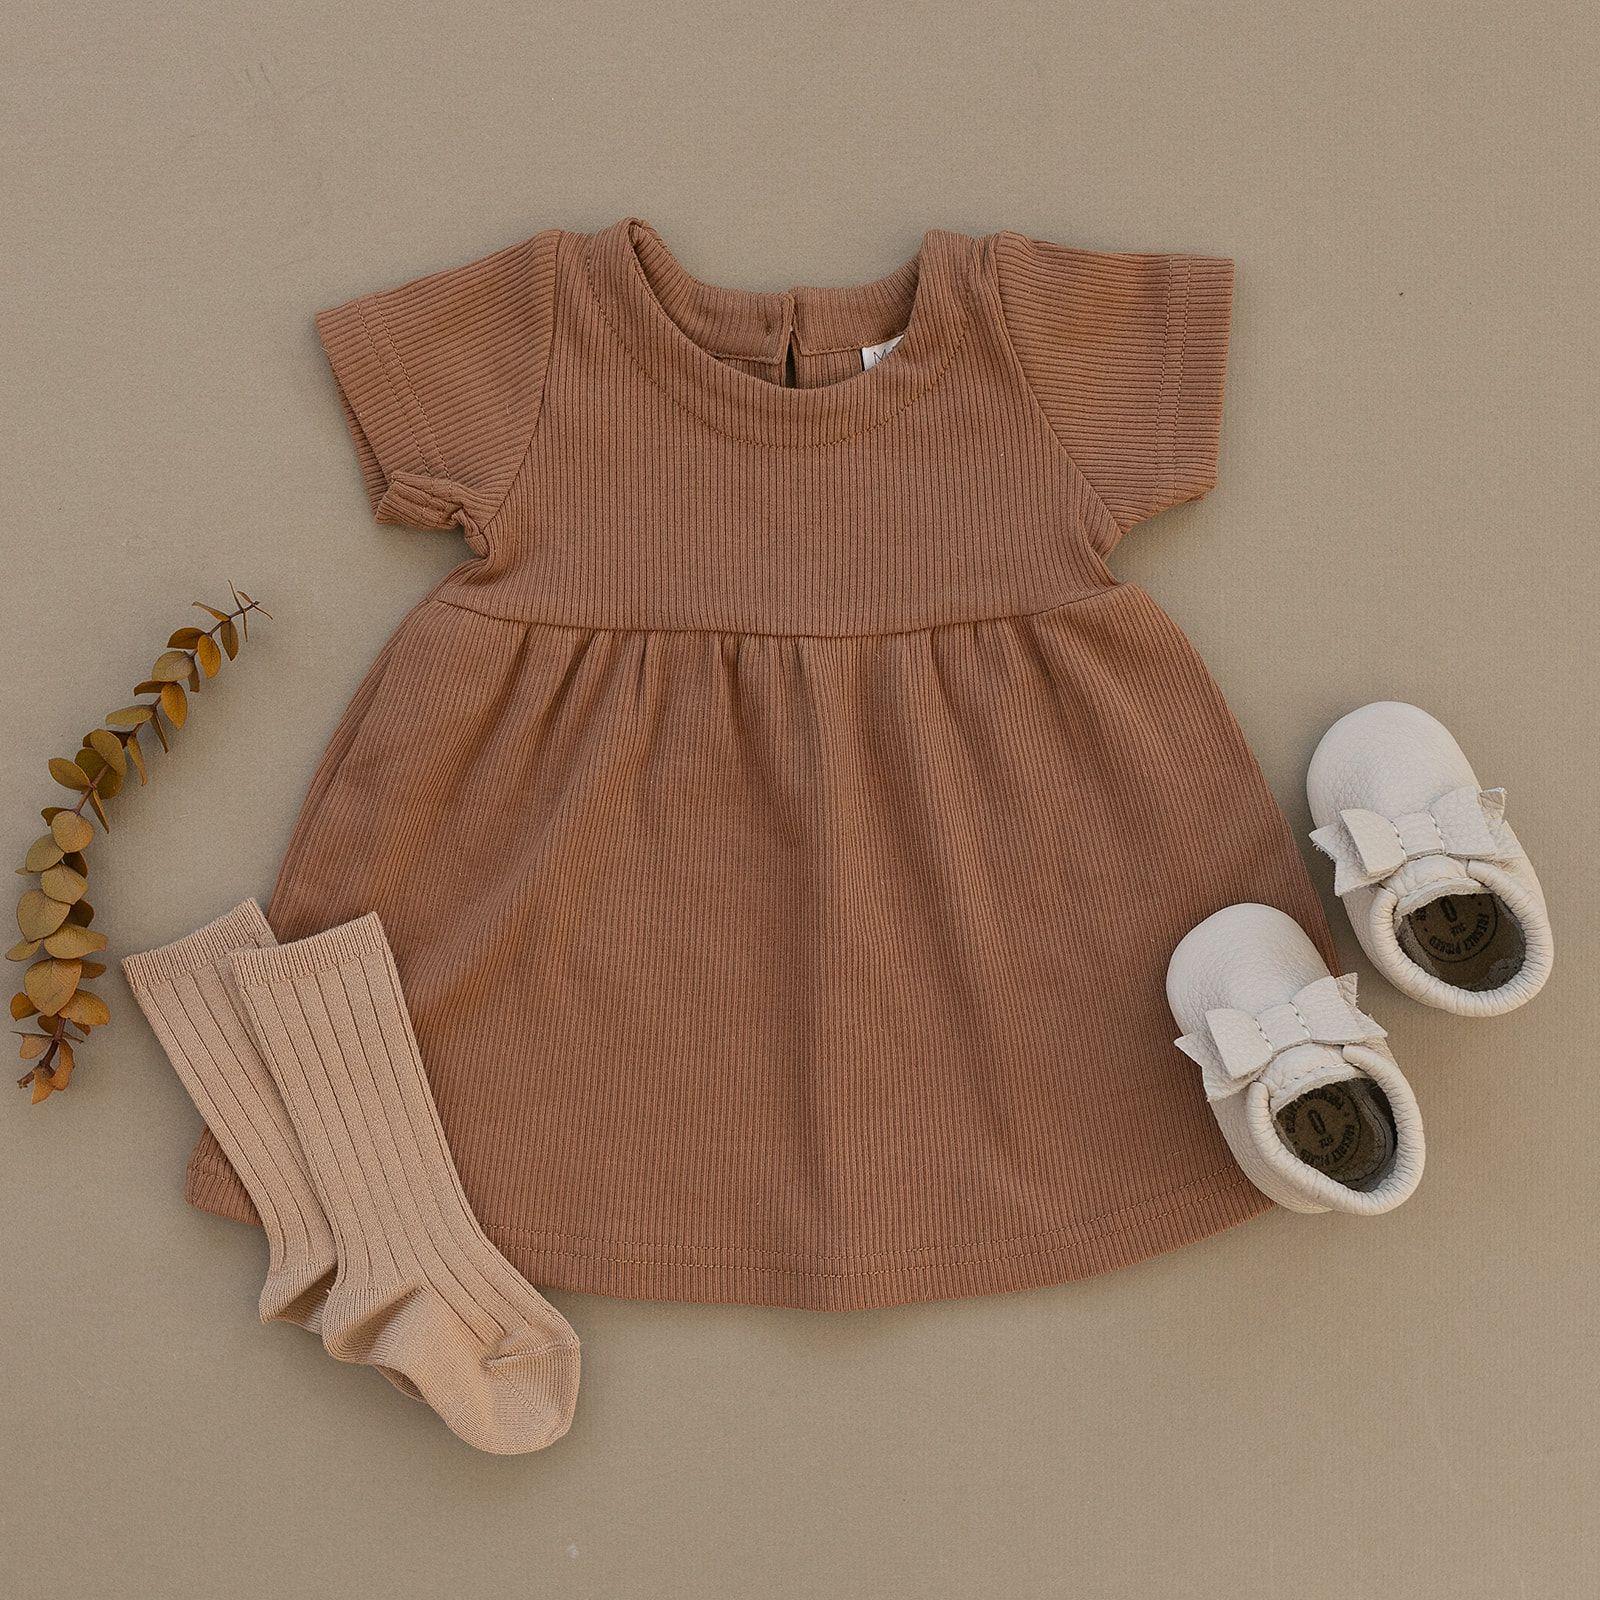 Mebie Baby Ribbed Cotton Dress  Boho baby clothes, Boho baby girl